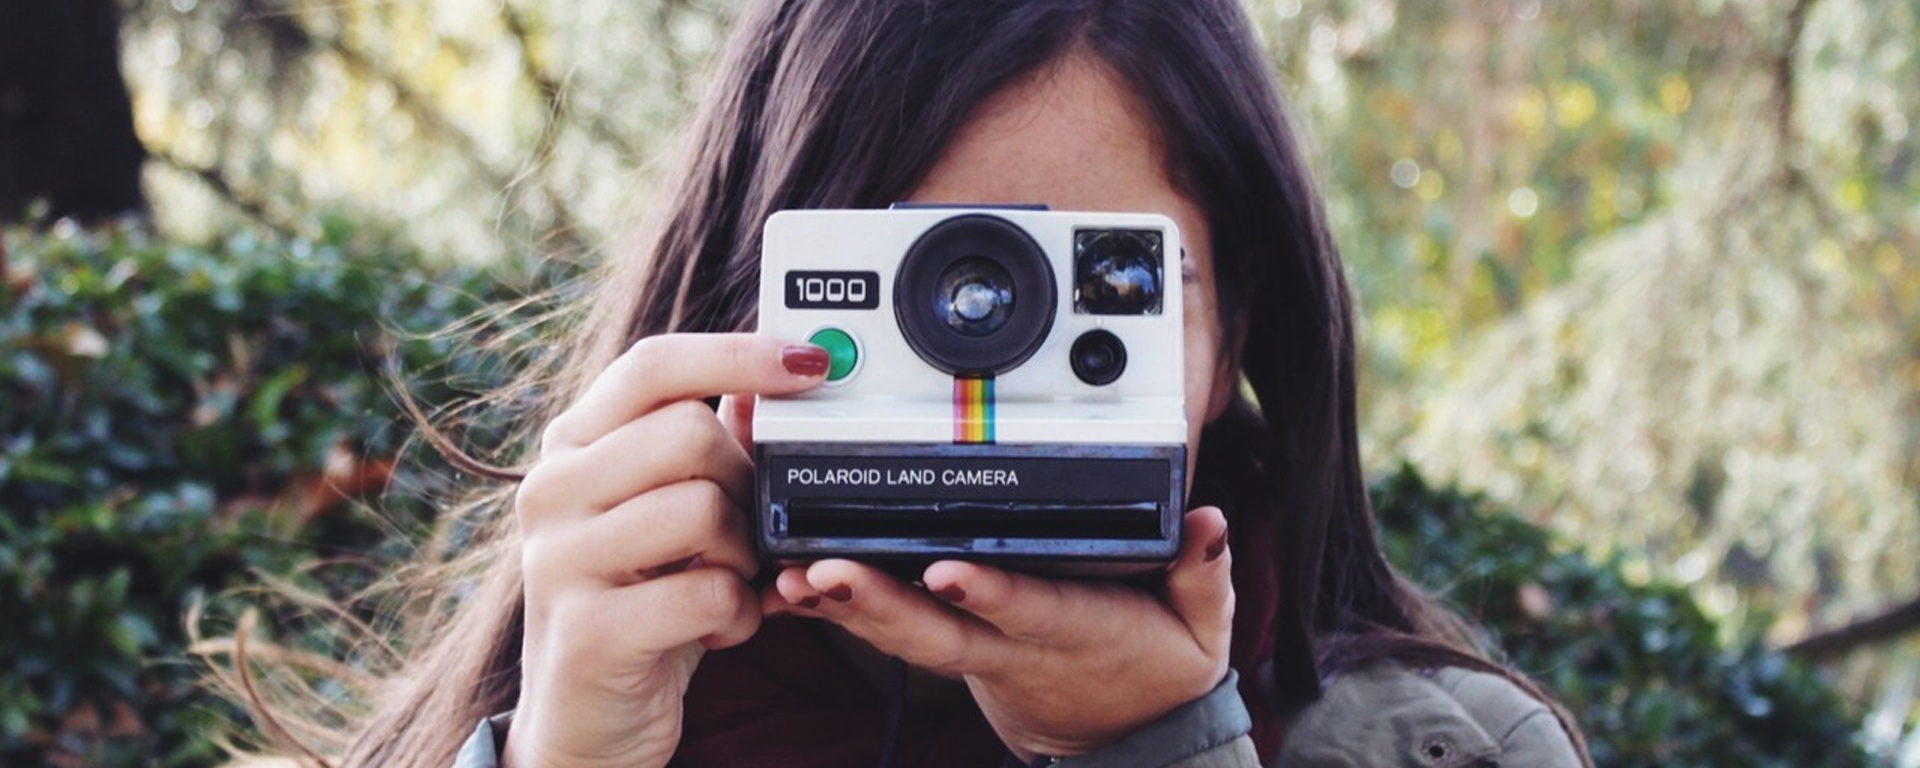 Polaroid modelo 1000